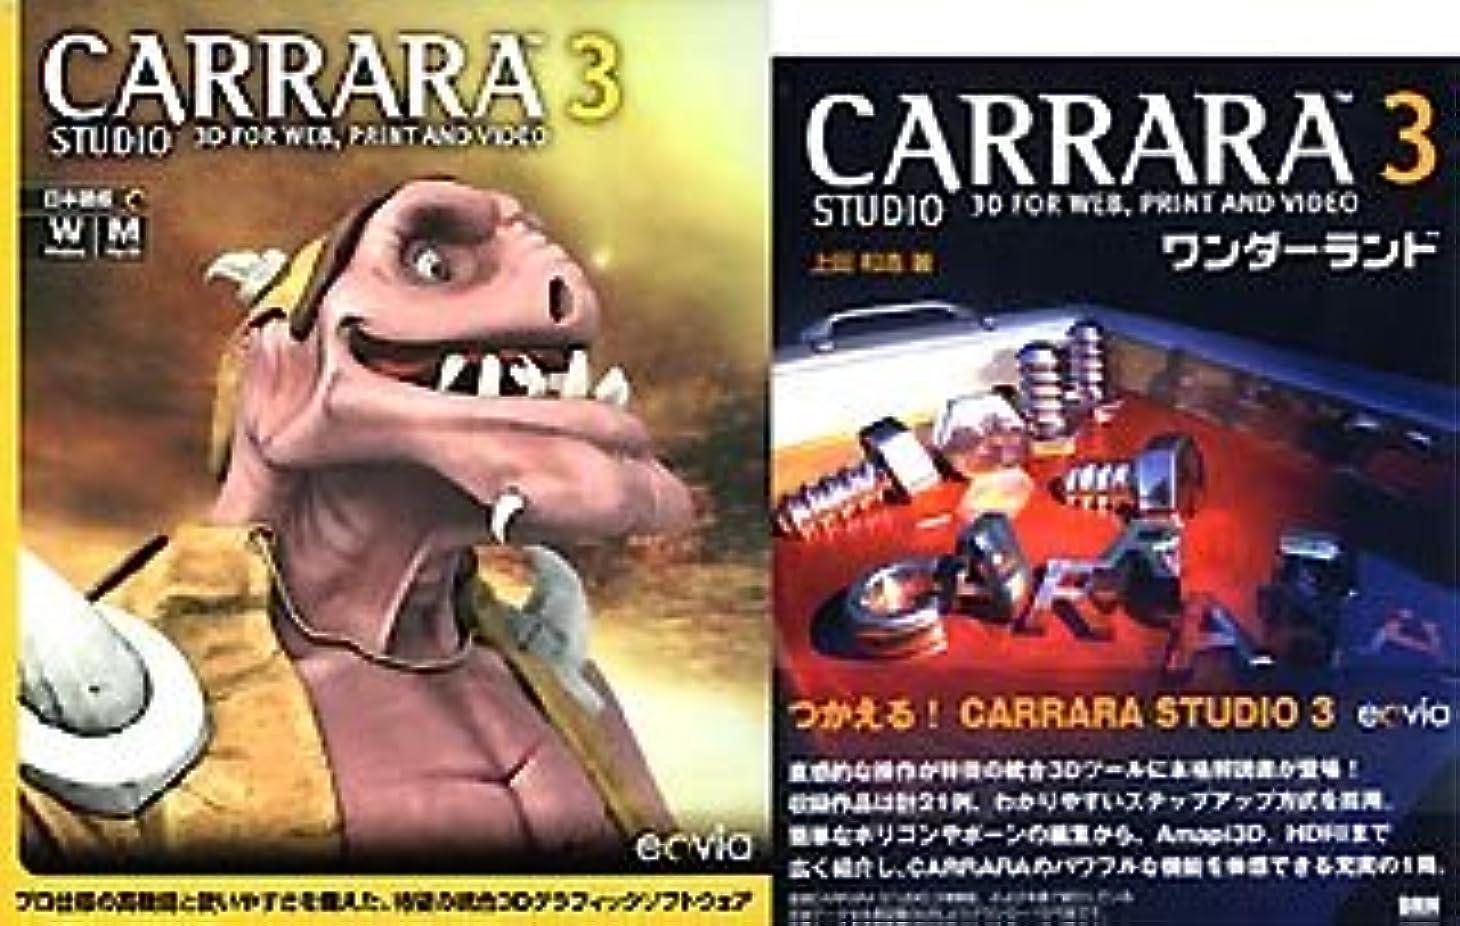 世代試用パイルCARRARA STUDIO 3 日本語版 解説書付